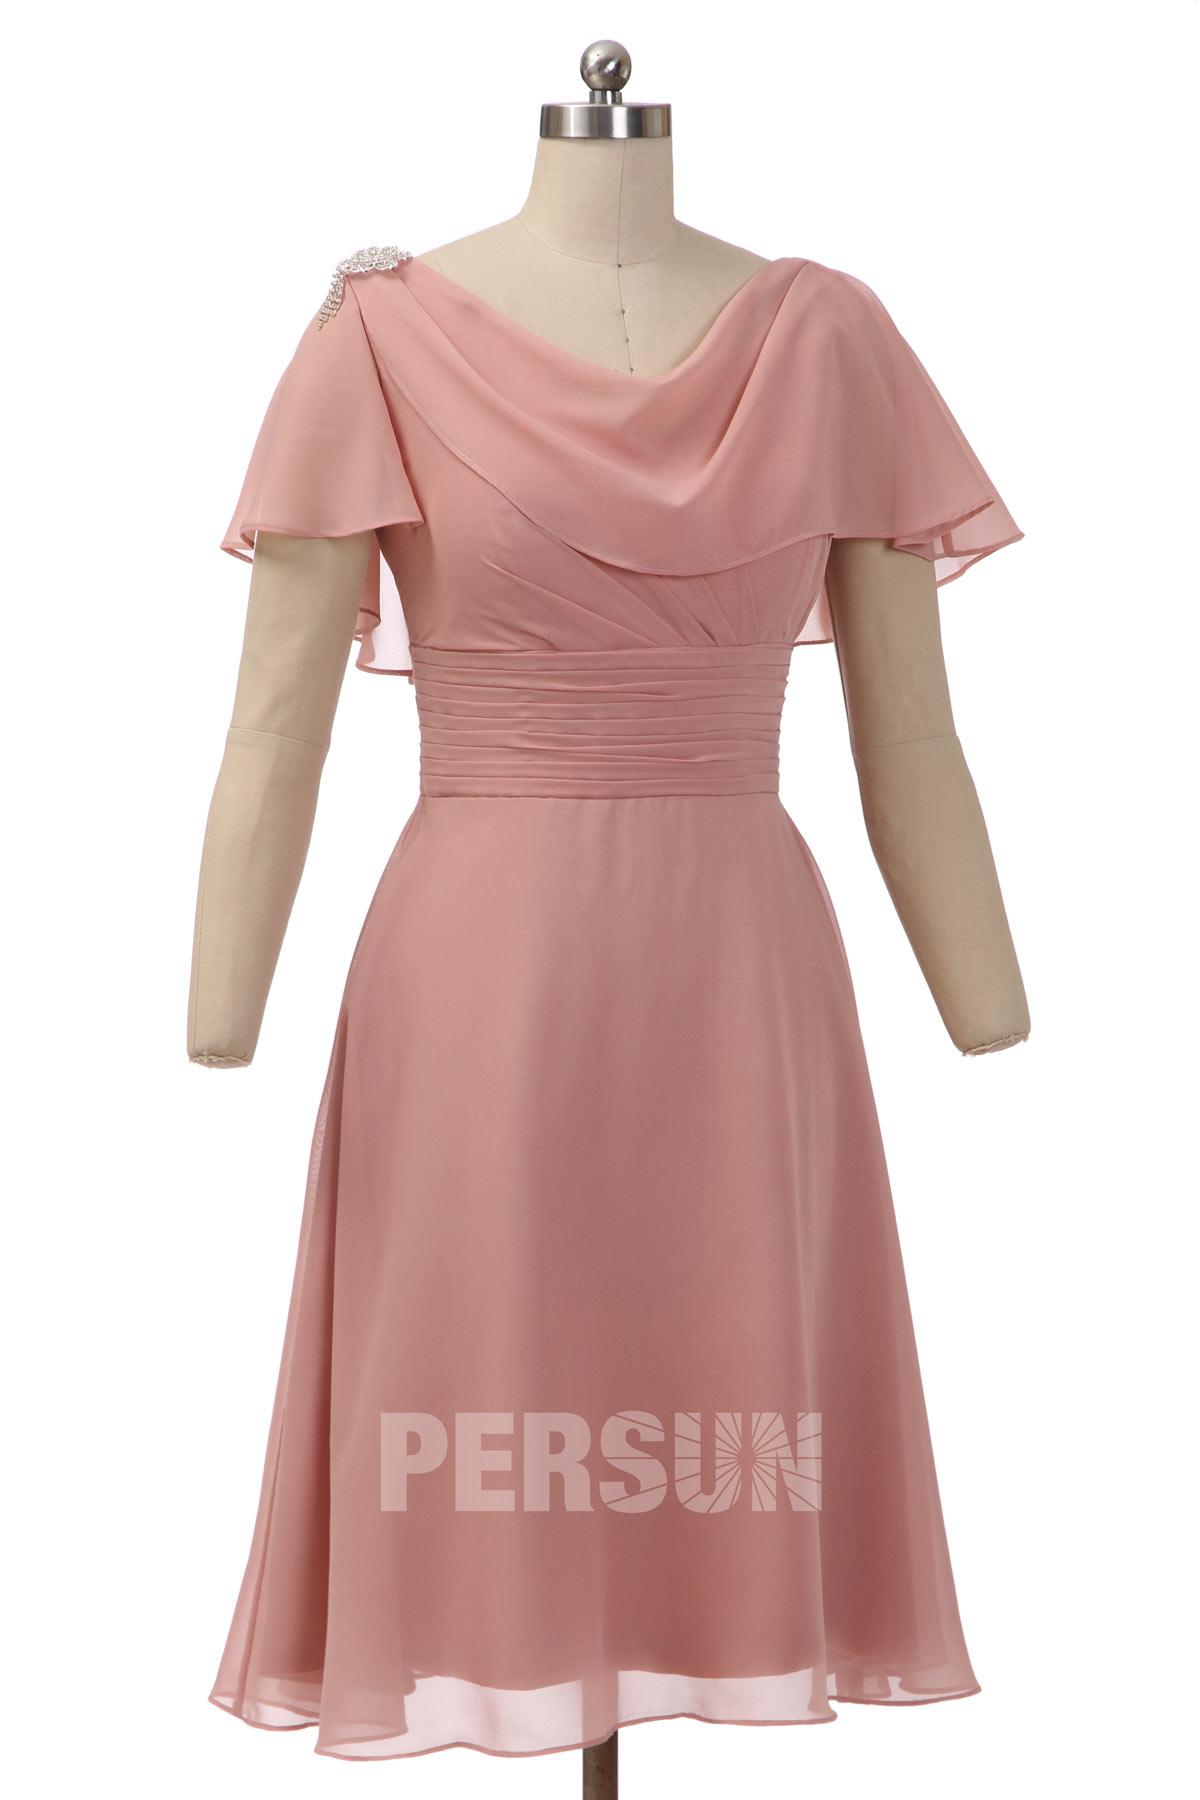 skin pink cocktail dress UK pas cher for bridesmaids